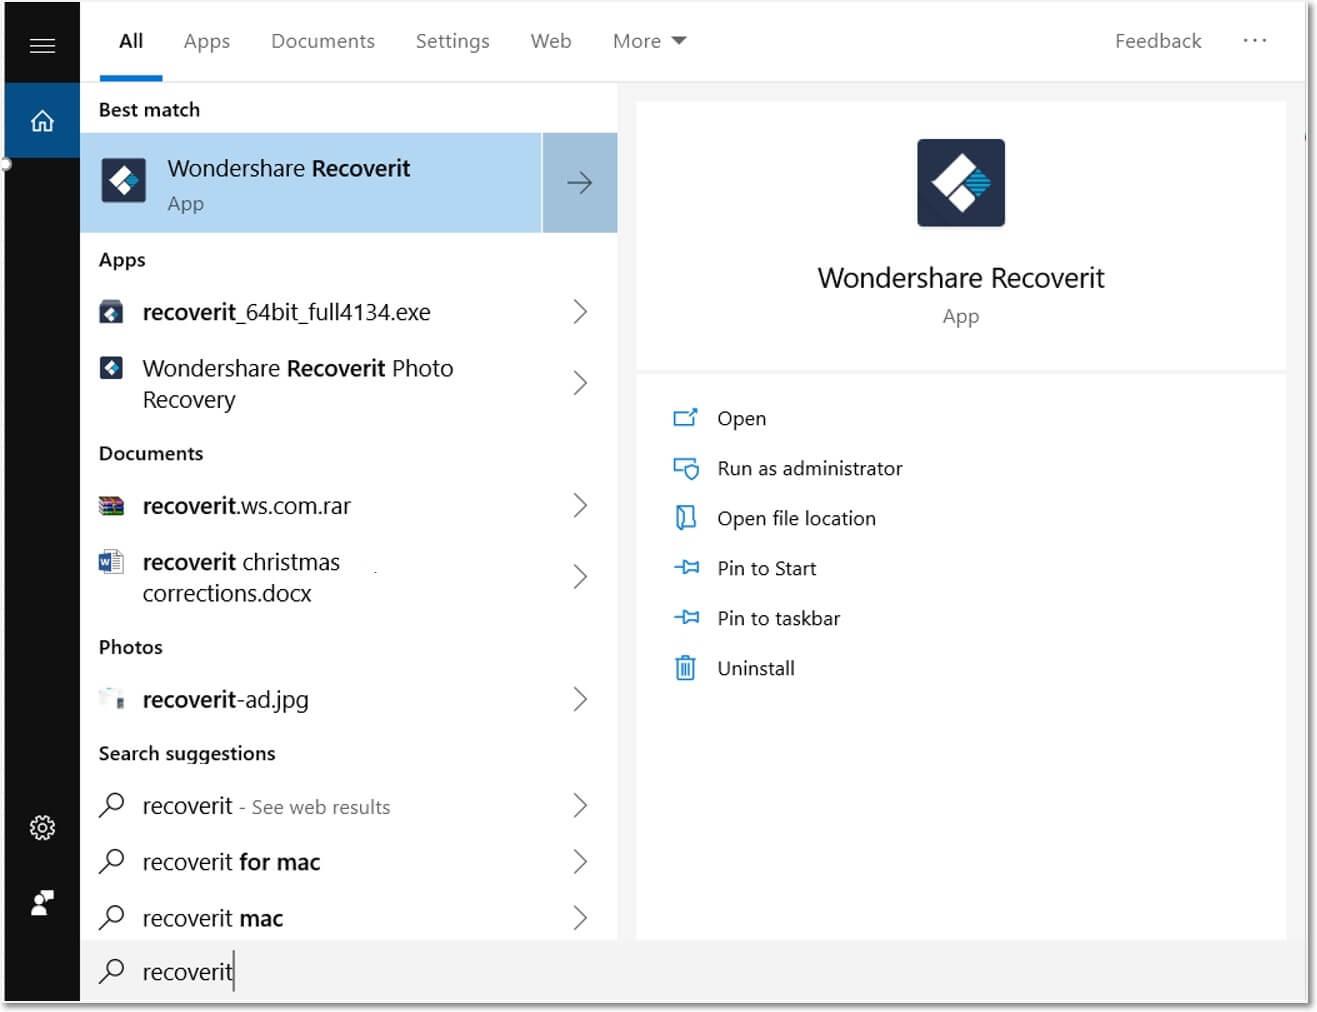 Wondershare Recoverit 7.0.2 Crack licence key